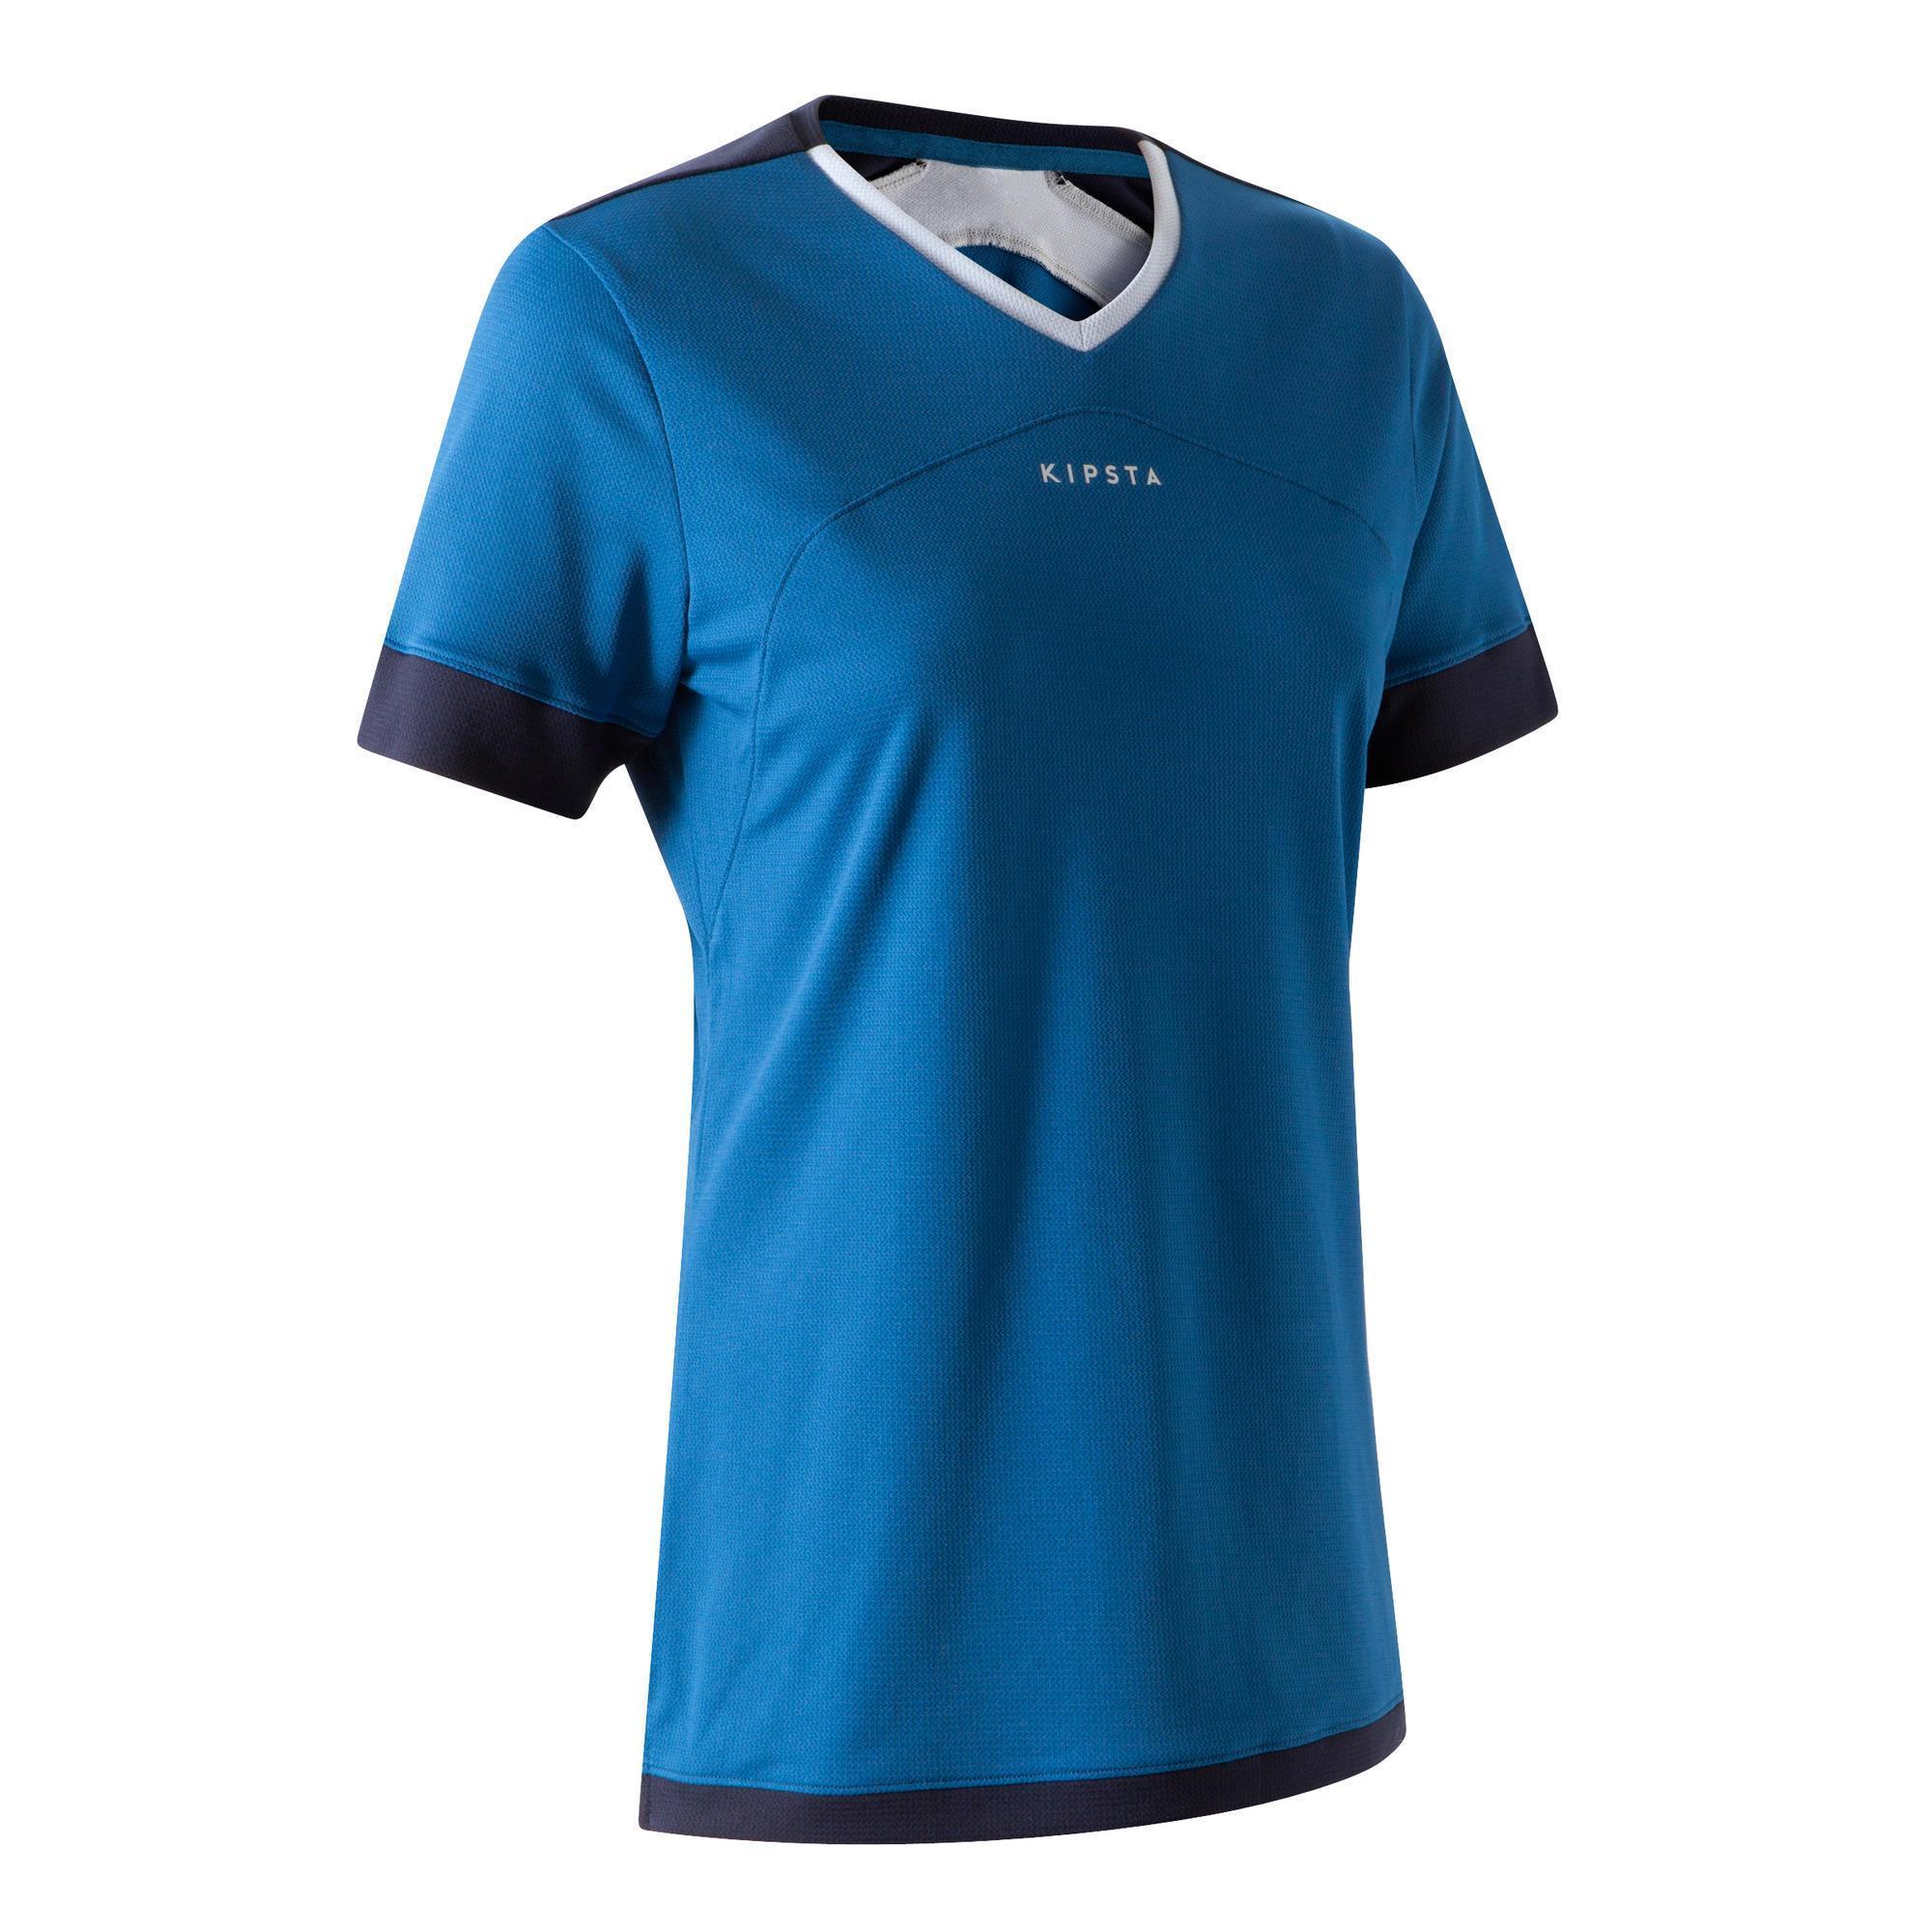 Kipsta Voetbalshirt dames F500 blauw